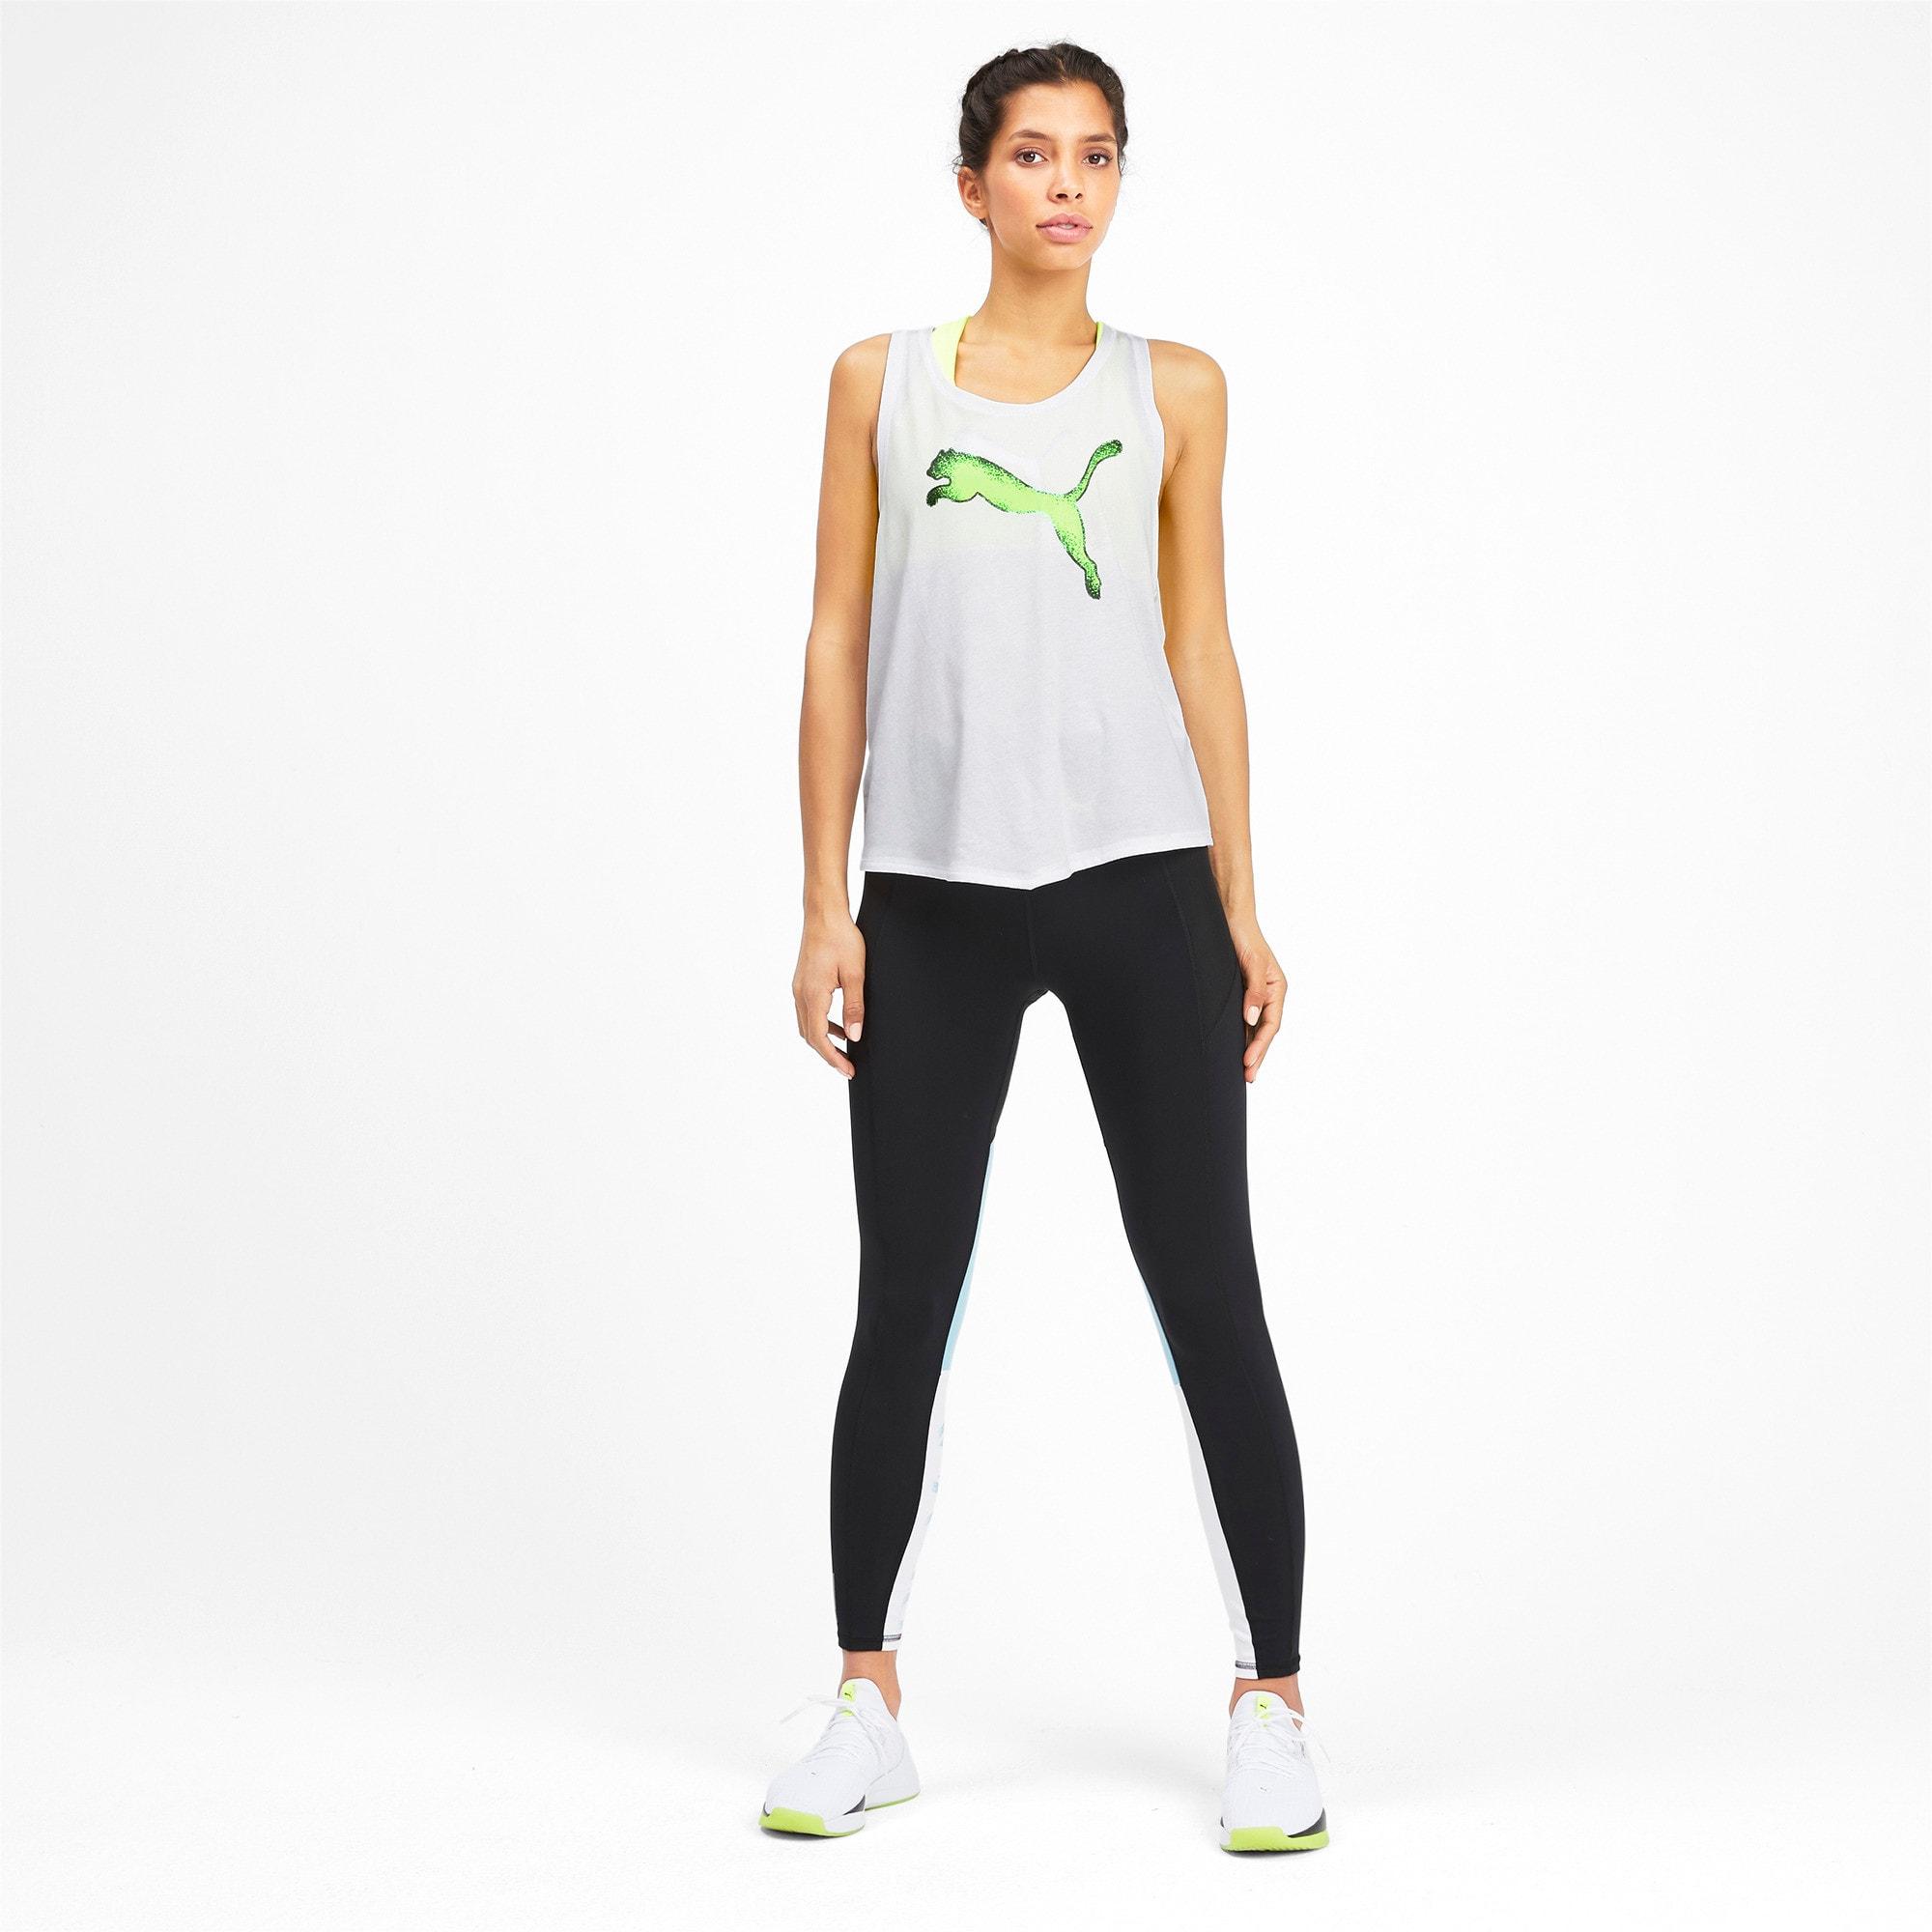 Miniatura 3 de Camiseta sin mangas HIT Feel It para mujer, Puma White, mediano